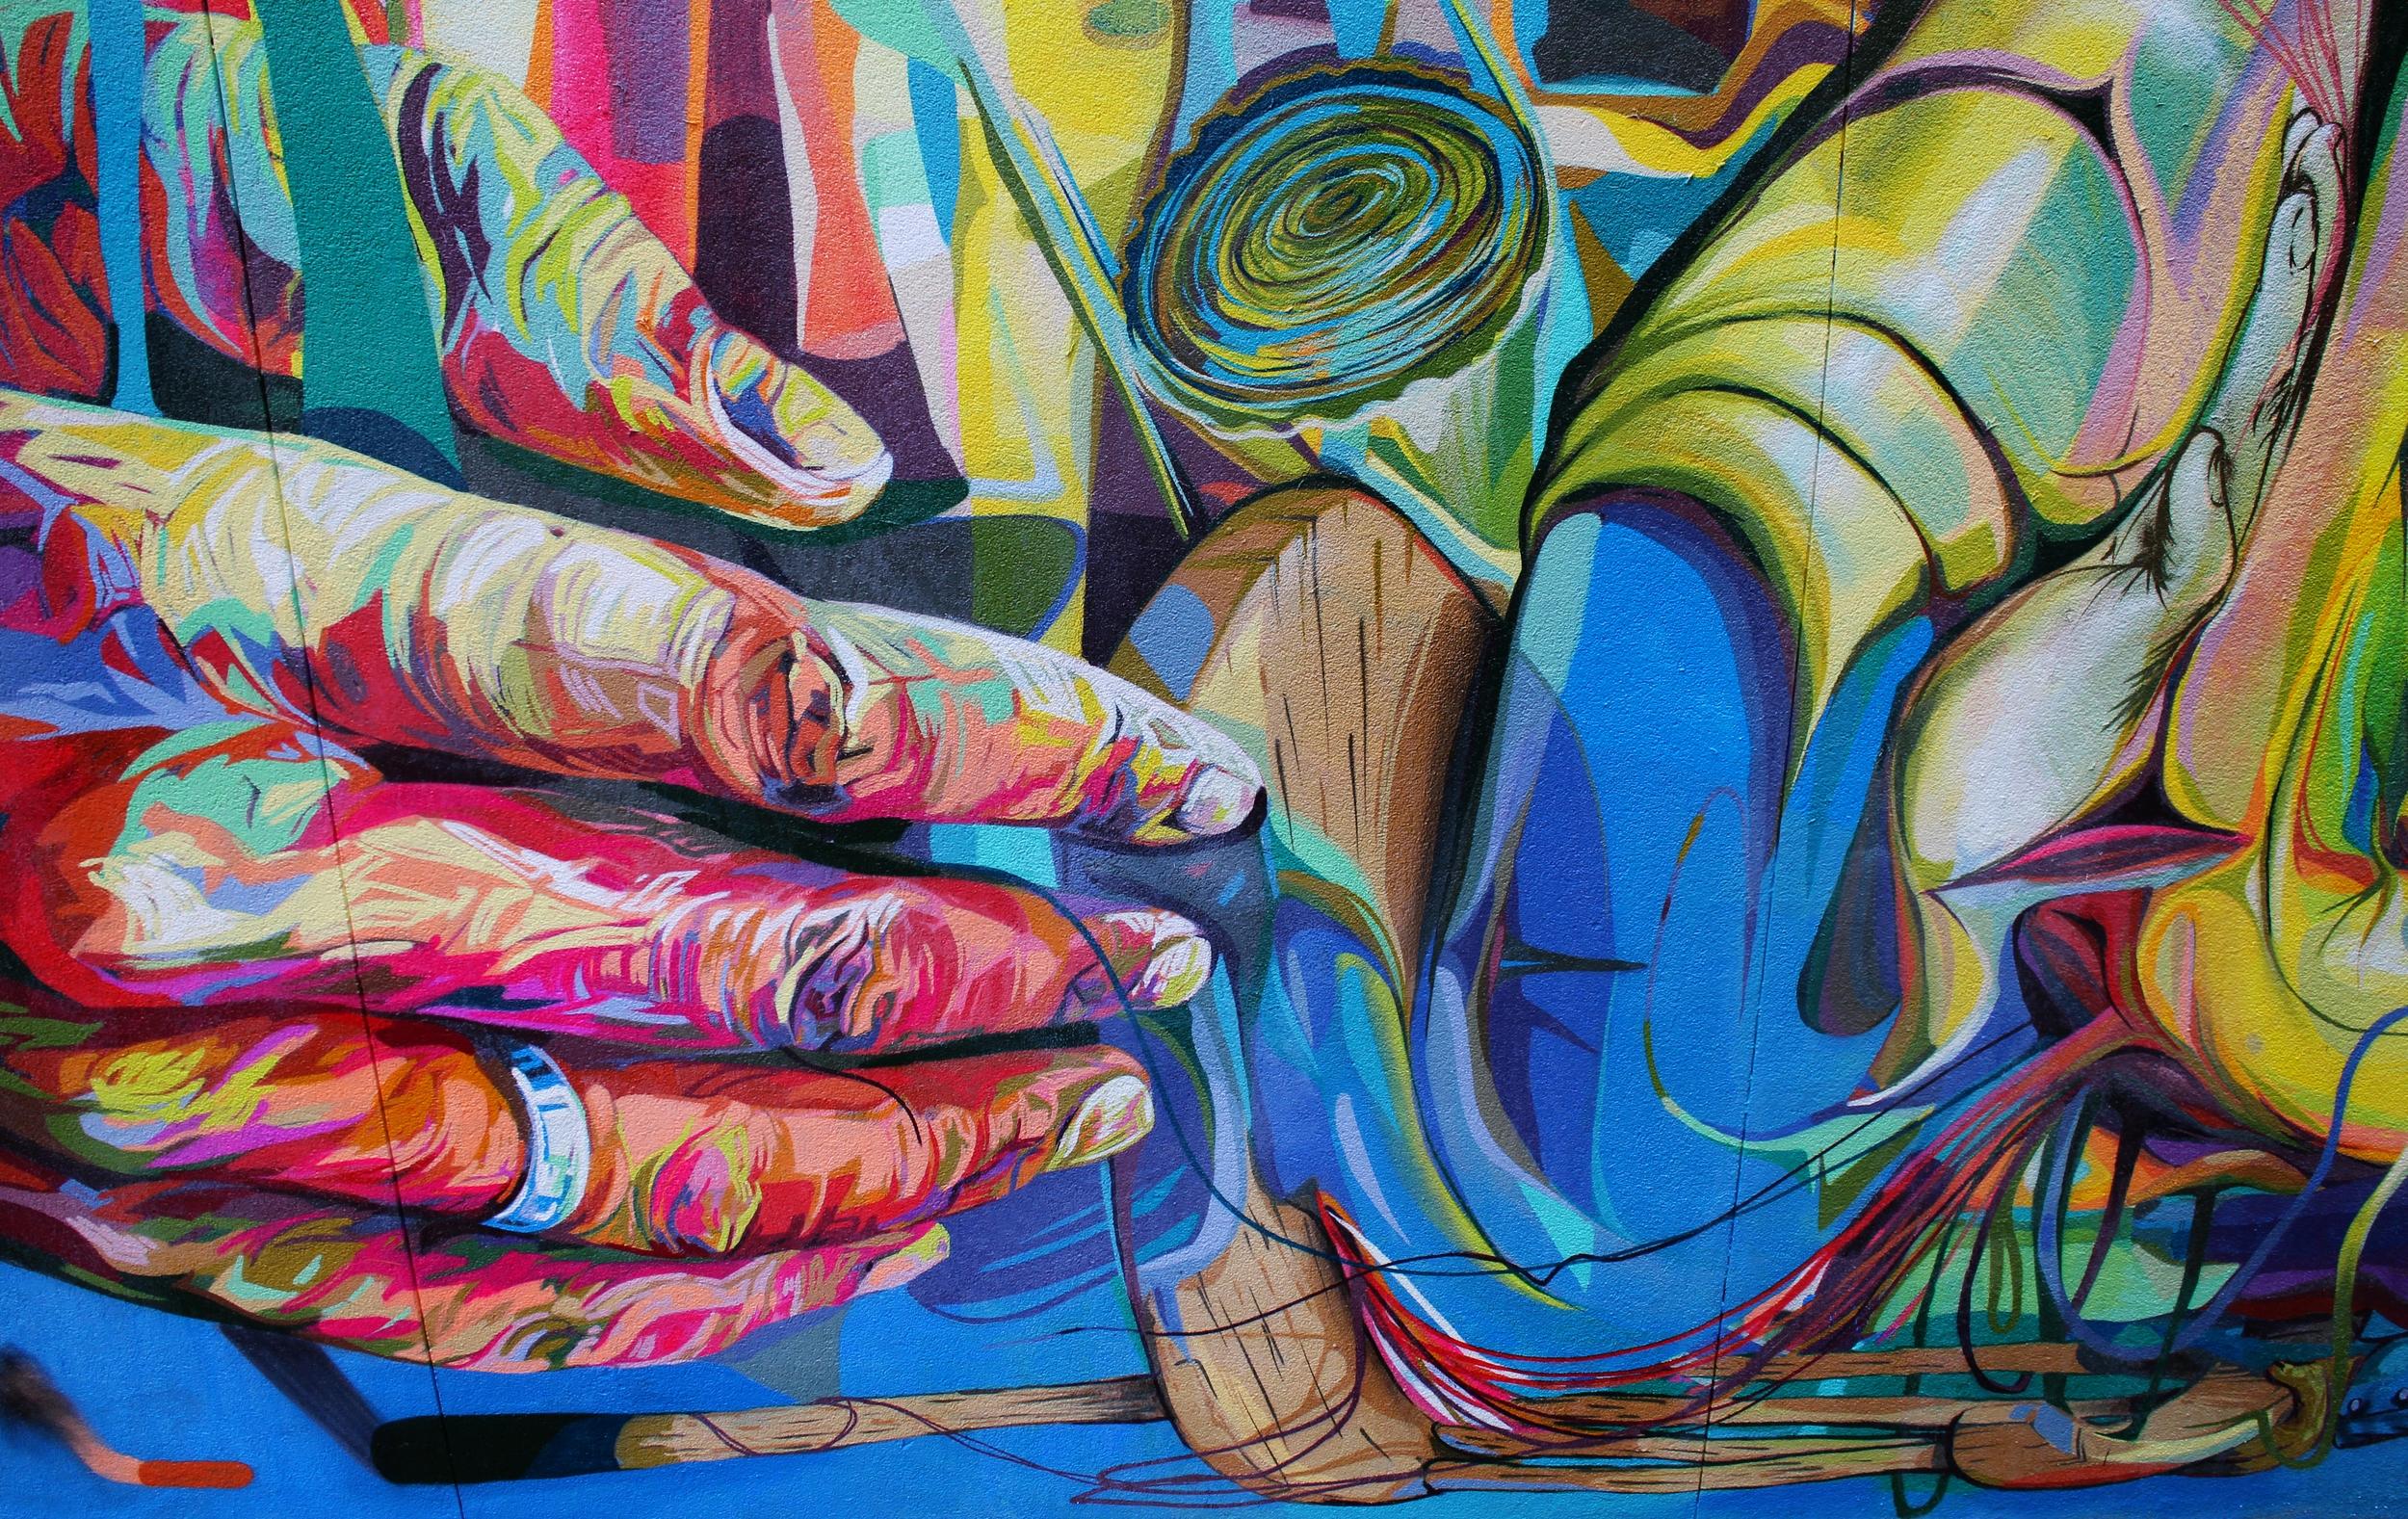 LERCH'S BLANK CANVAS, Trinity-Bellwoods Park, Toronto, ON, 2014  25x50', latex and spray paint